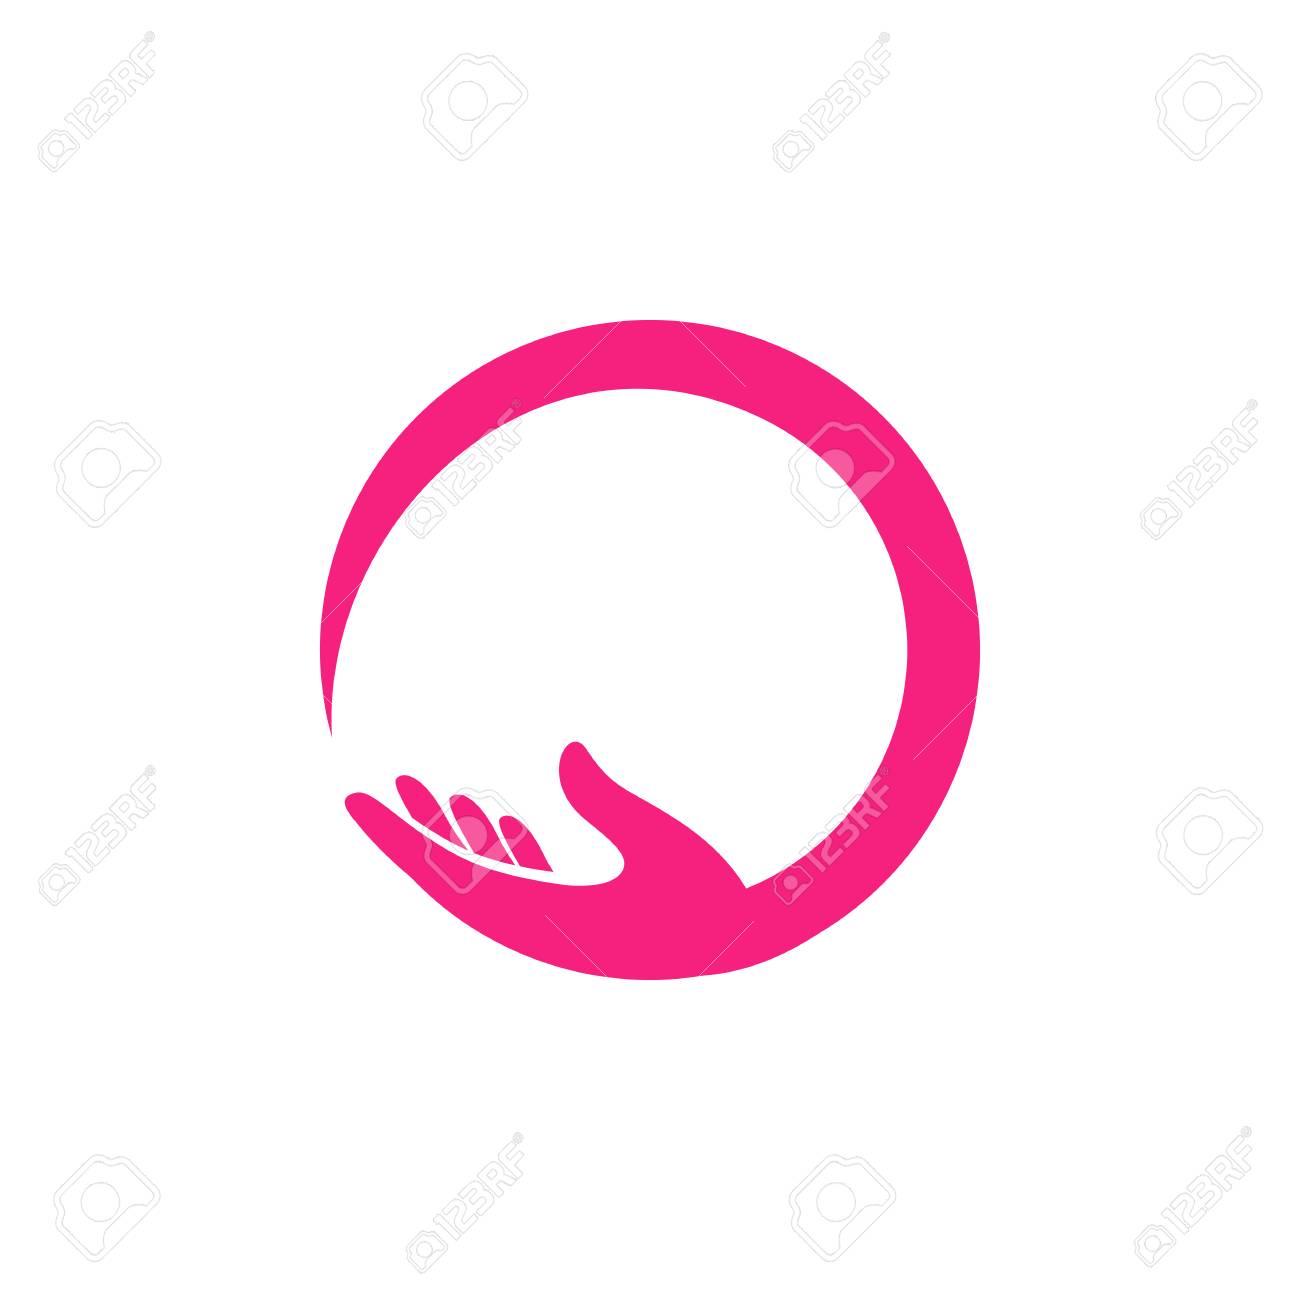 hand care logo design template. hand care vector icon illustration - 117628555